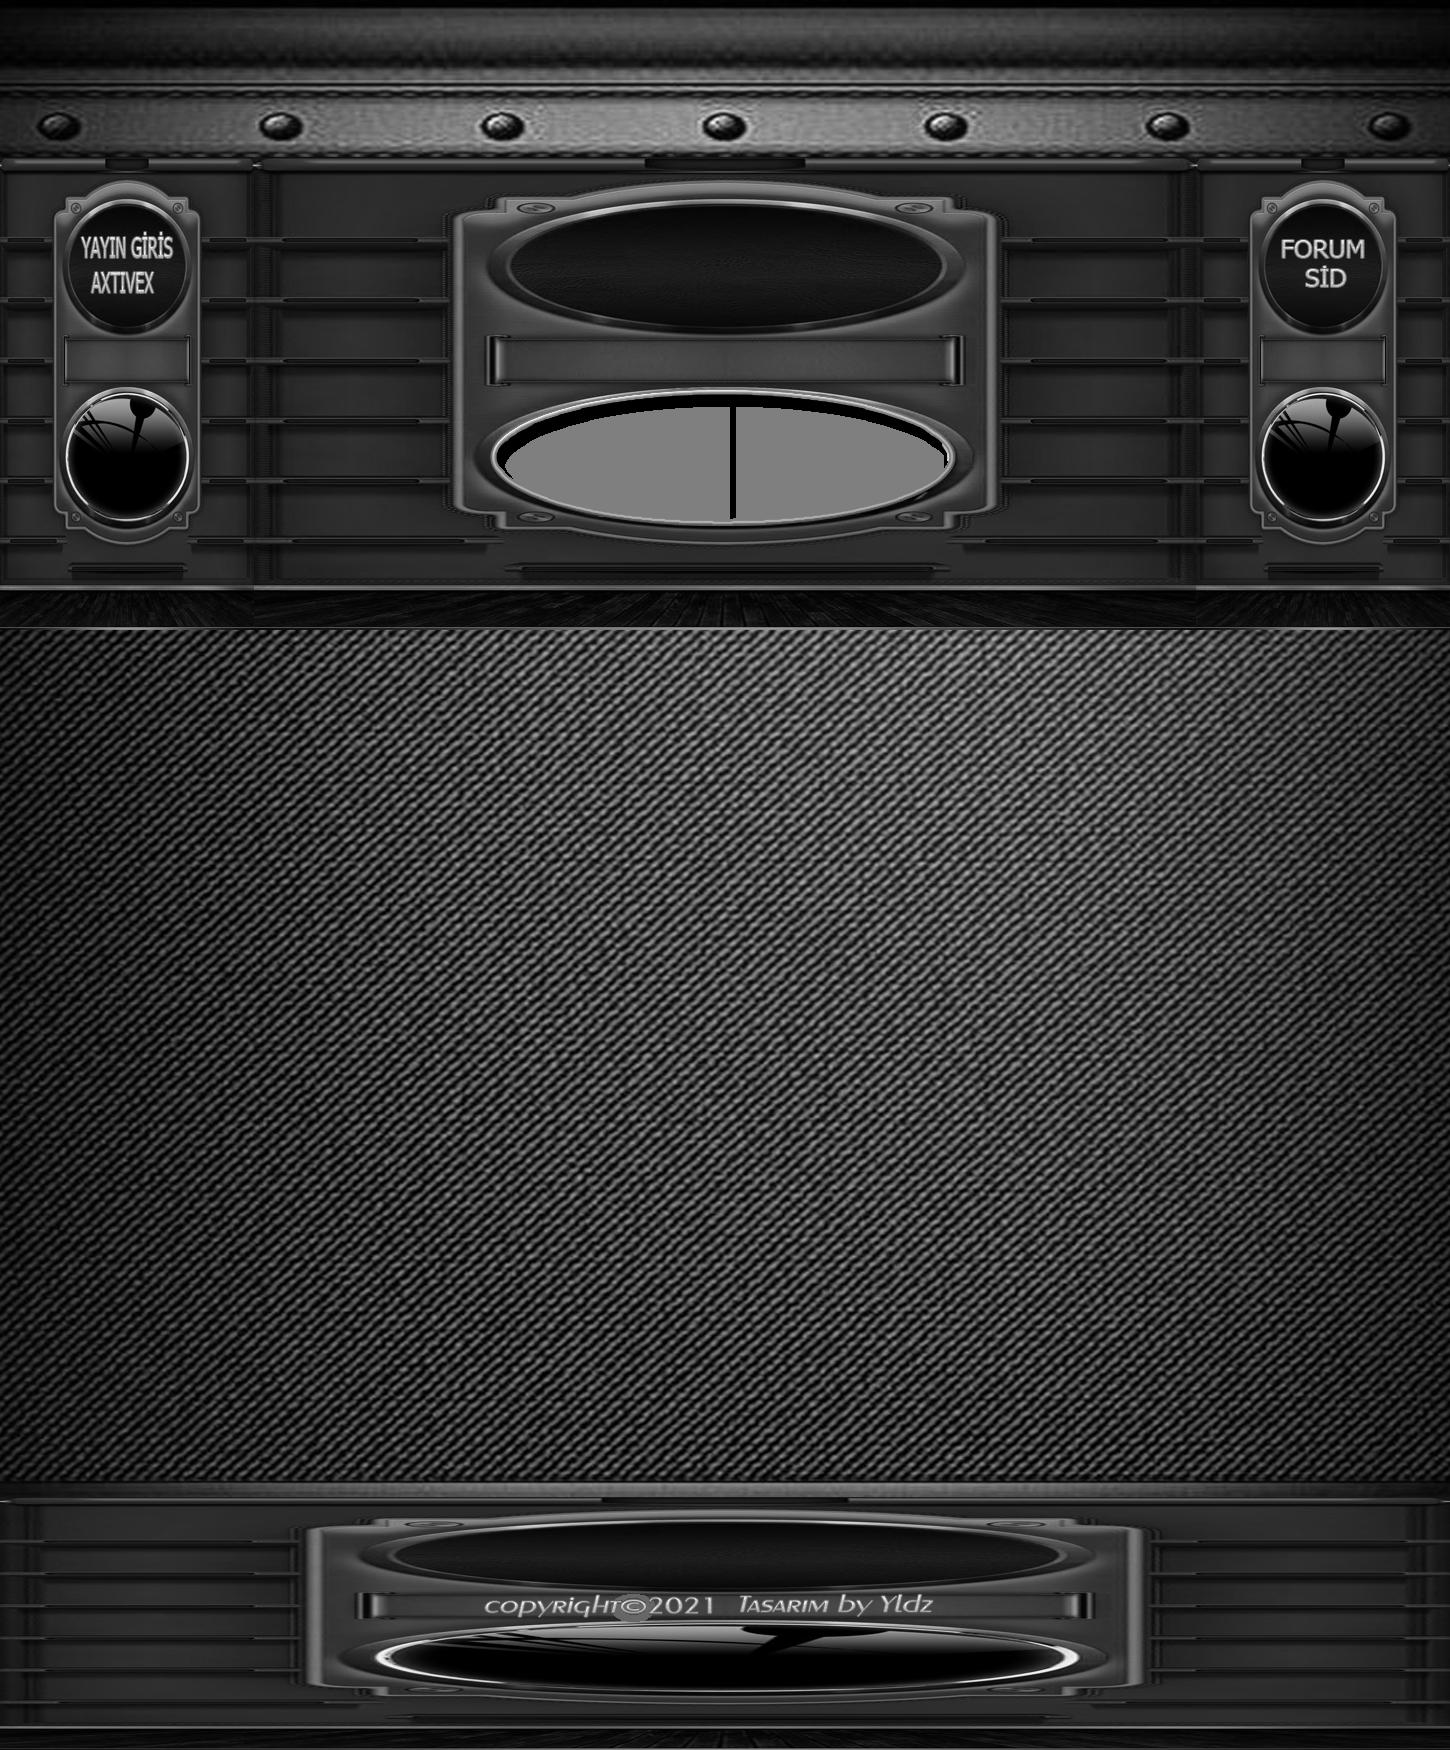 Gri Radyo İndex 1000x650